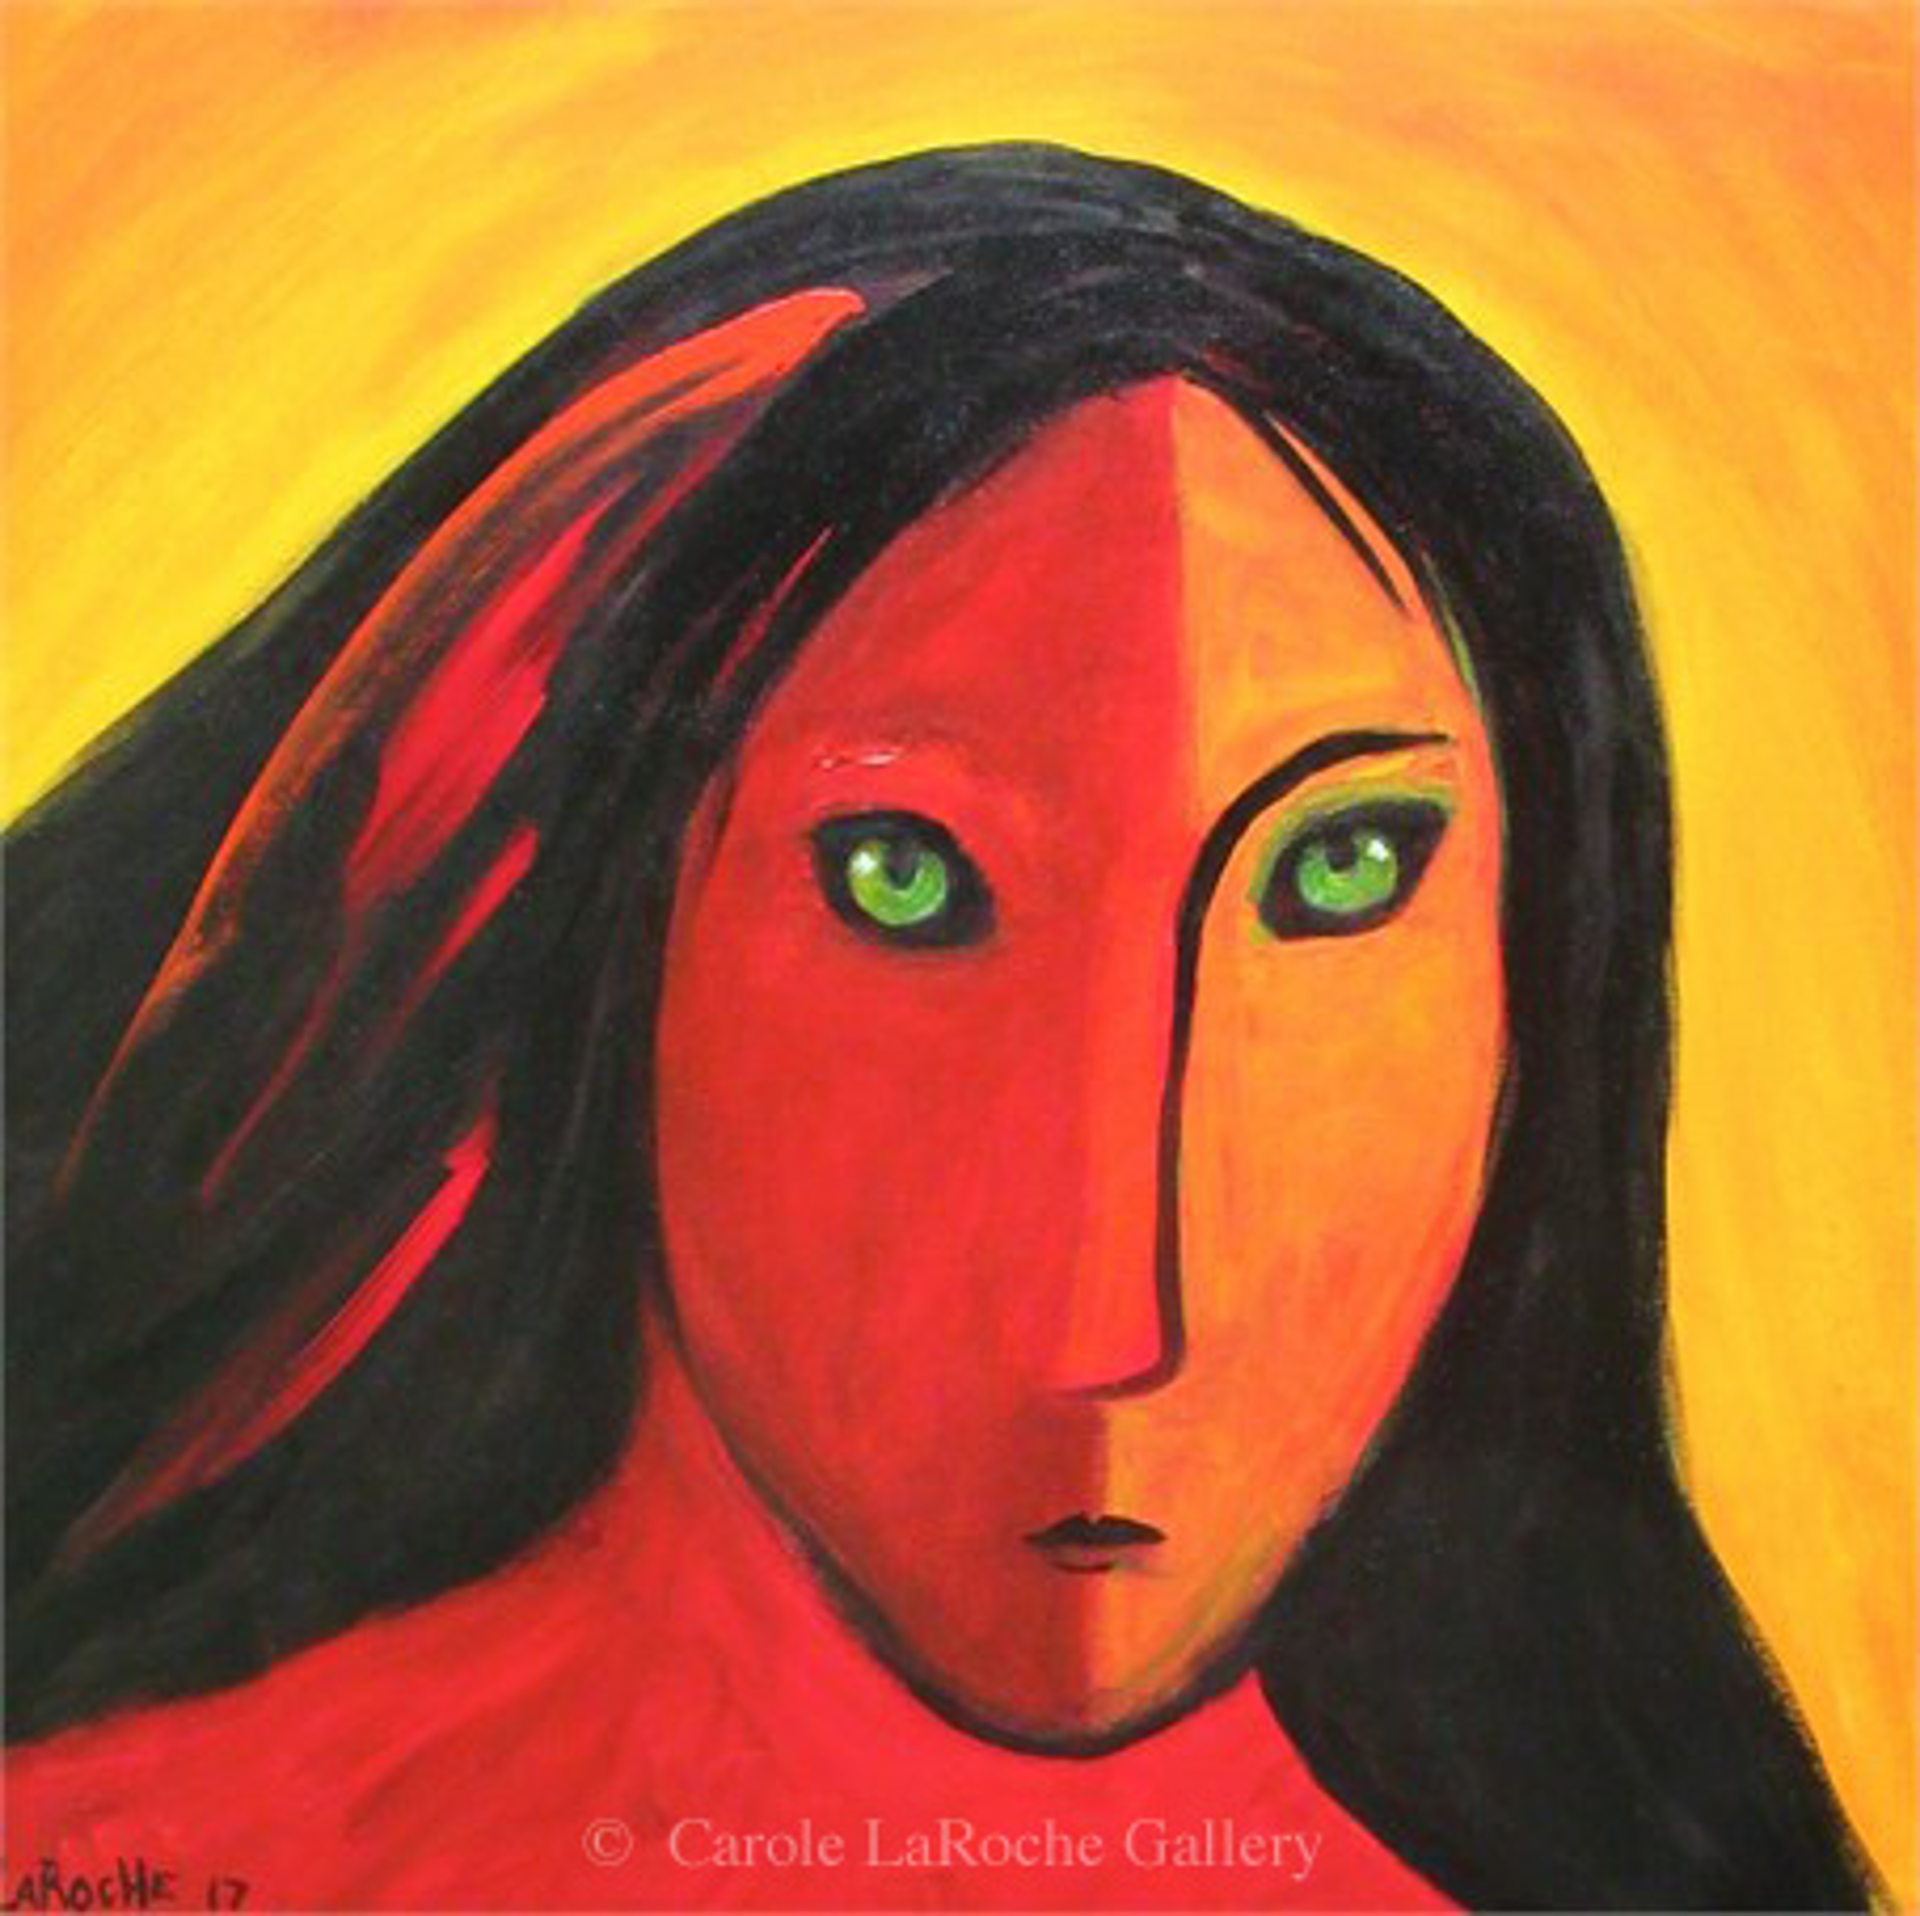 RED WARRIOR by Carole LaRoche